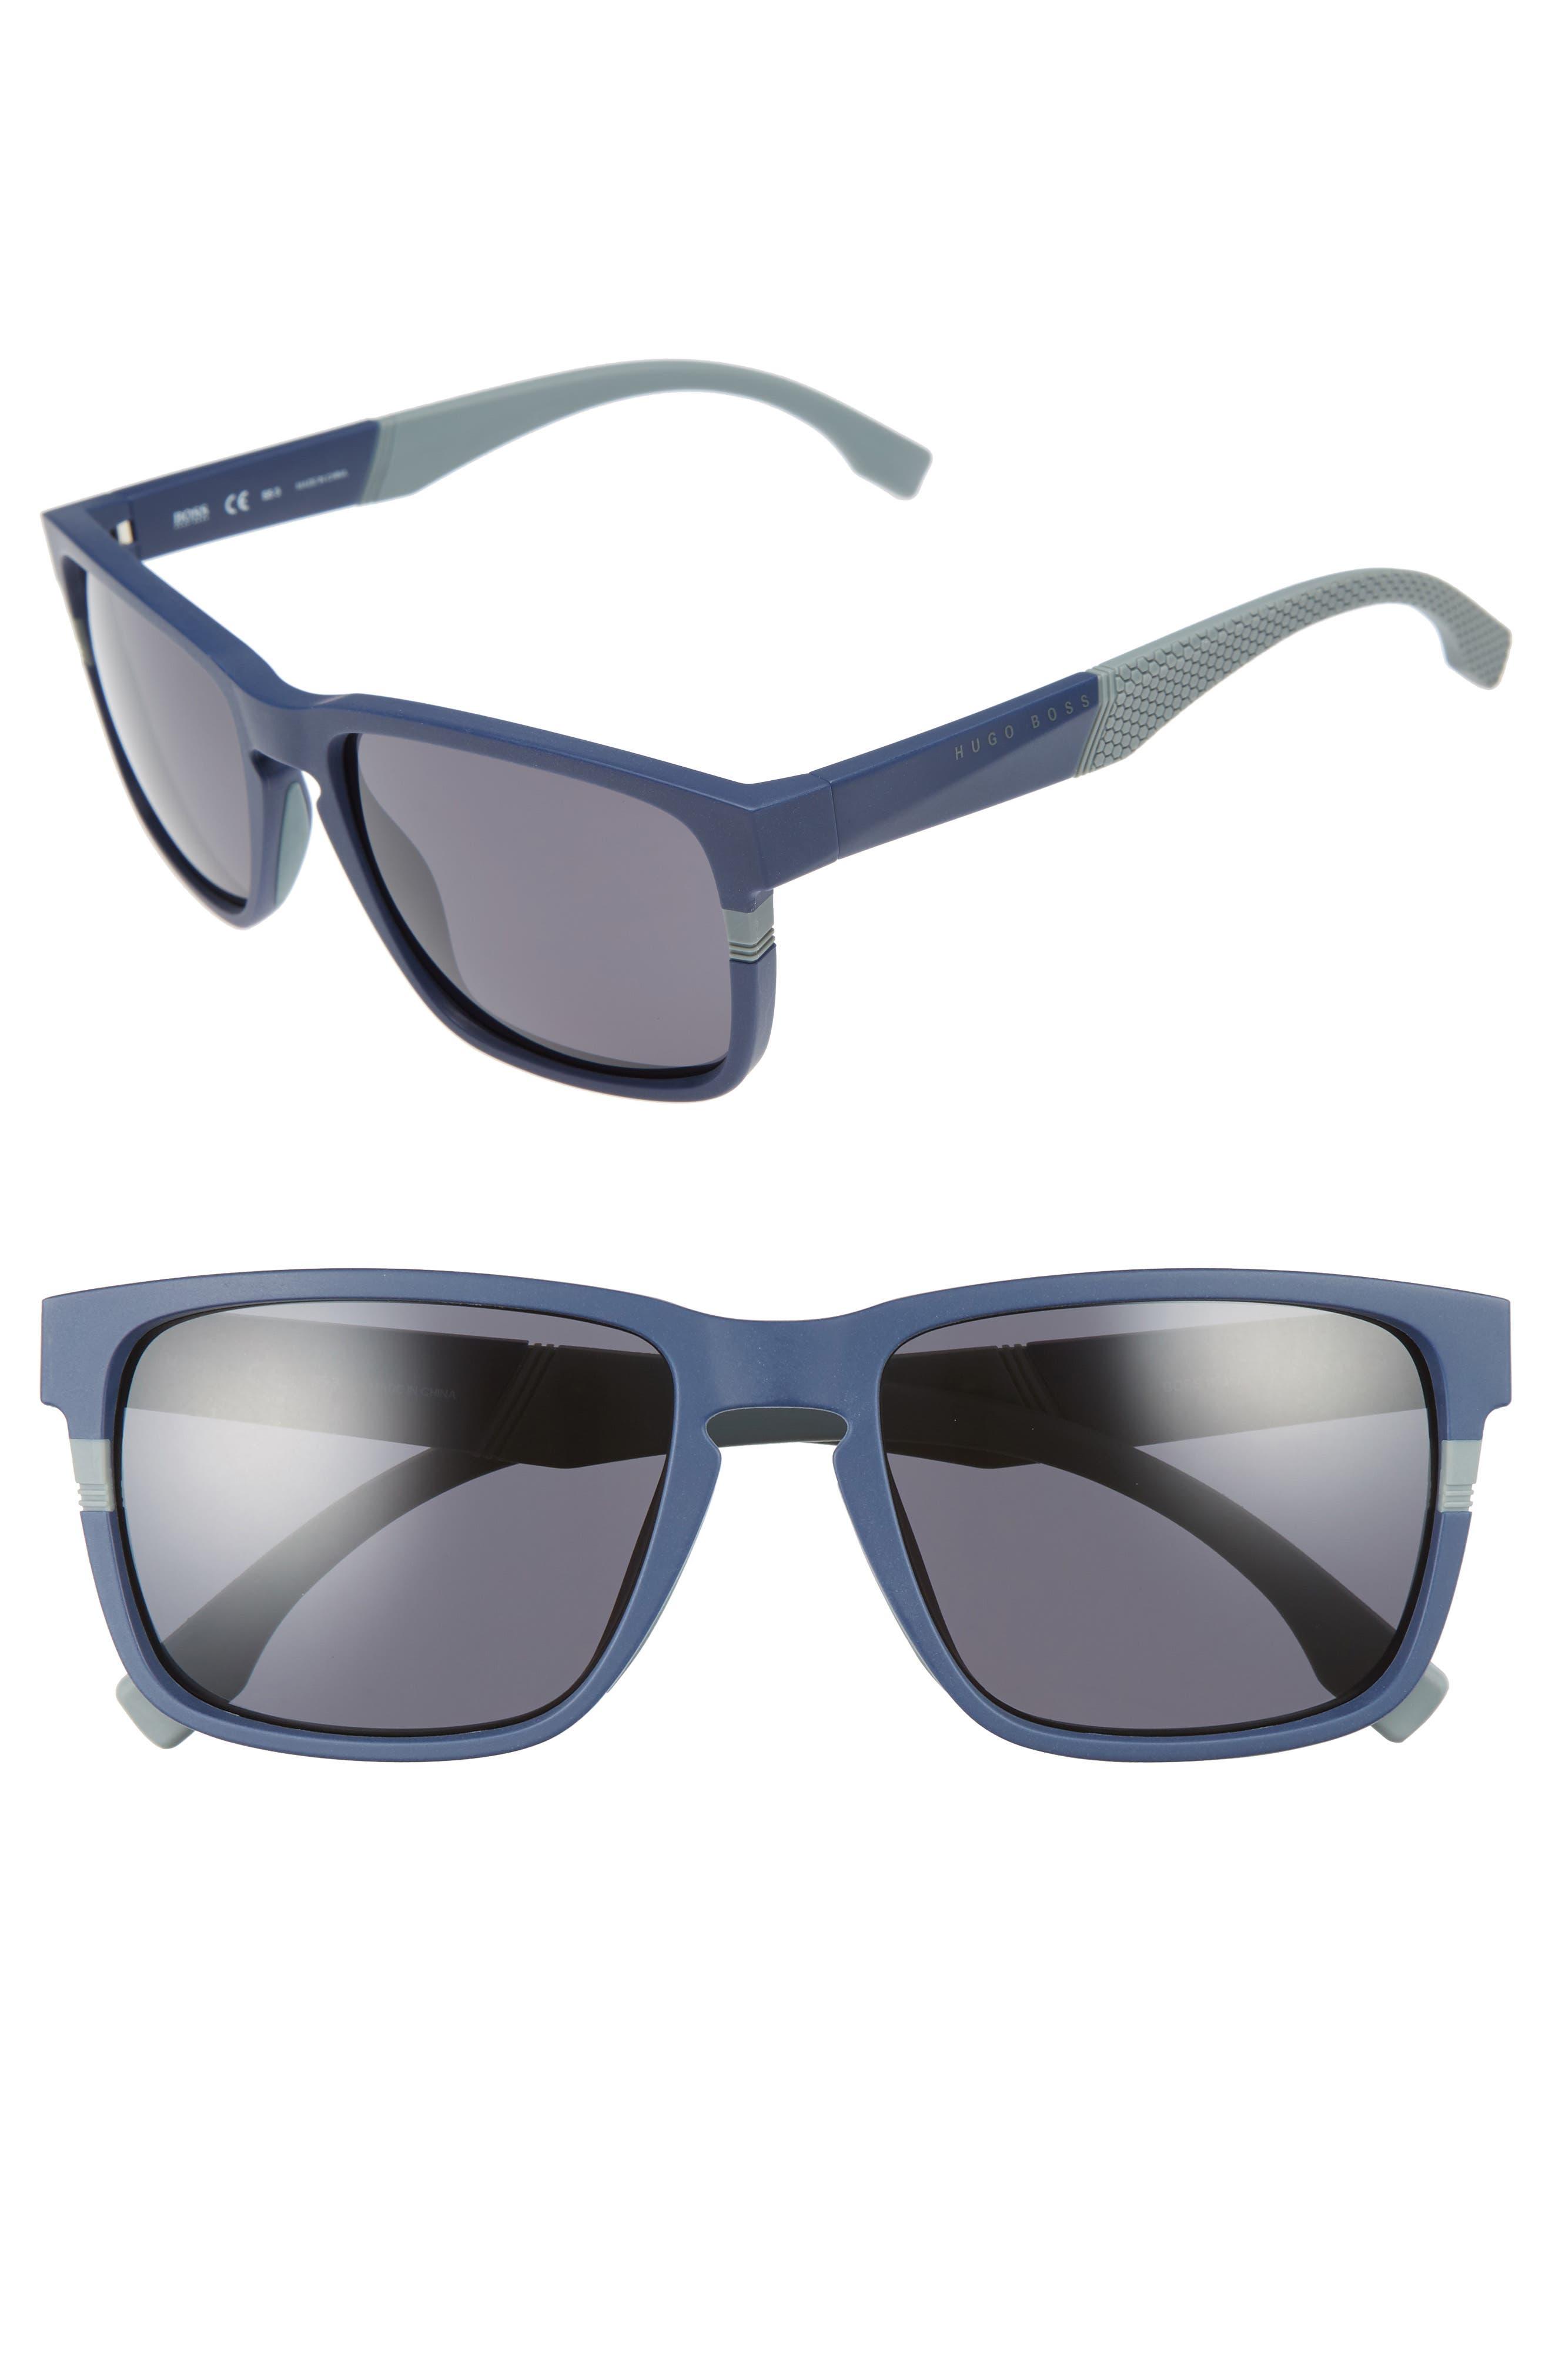 57mm Sunglasses,                             Main thumbnail 1, color,                             BLUE/ GREY BLUE